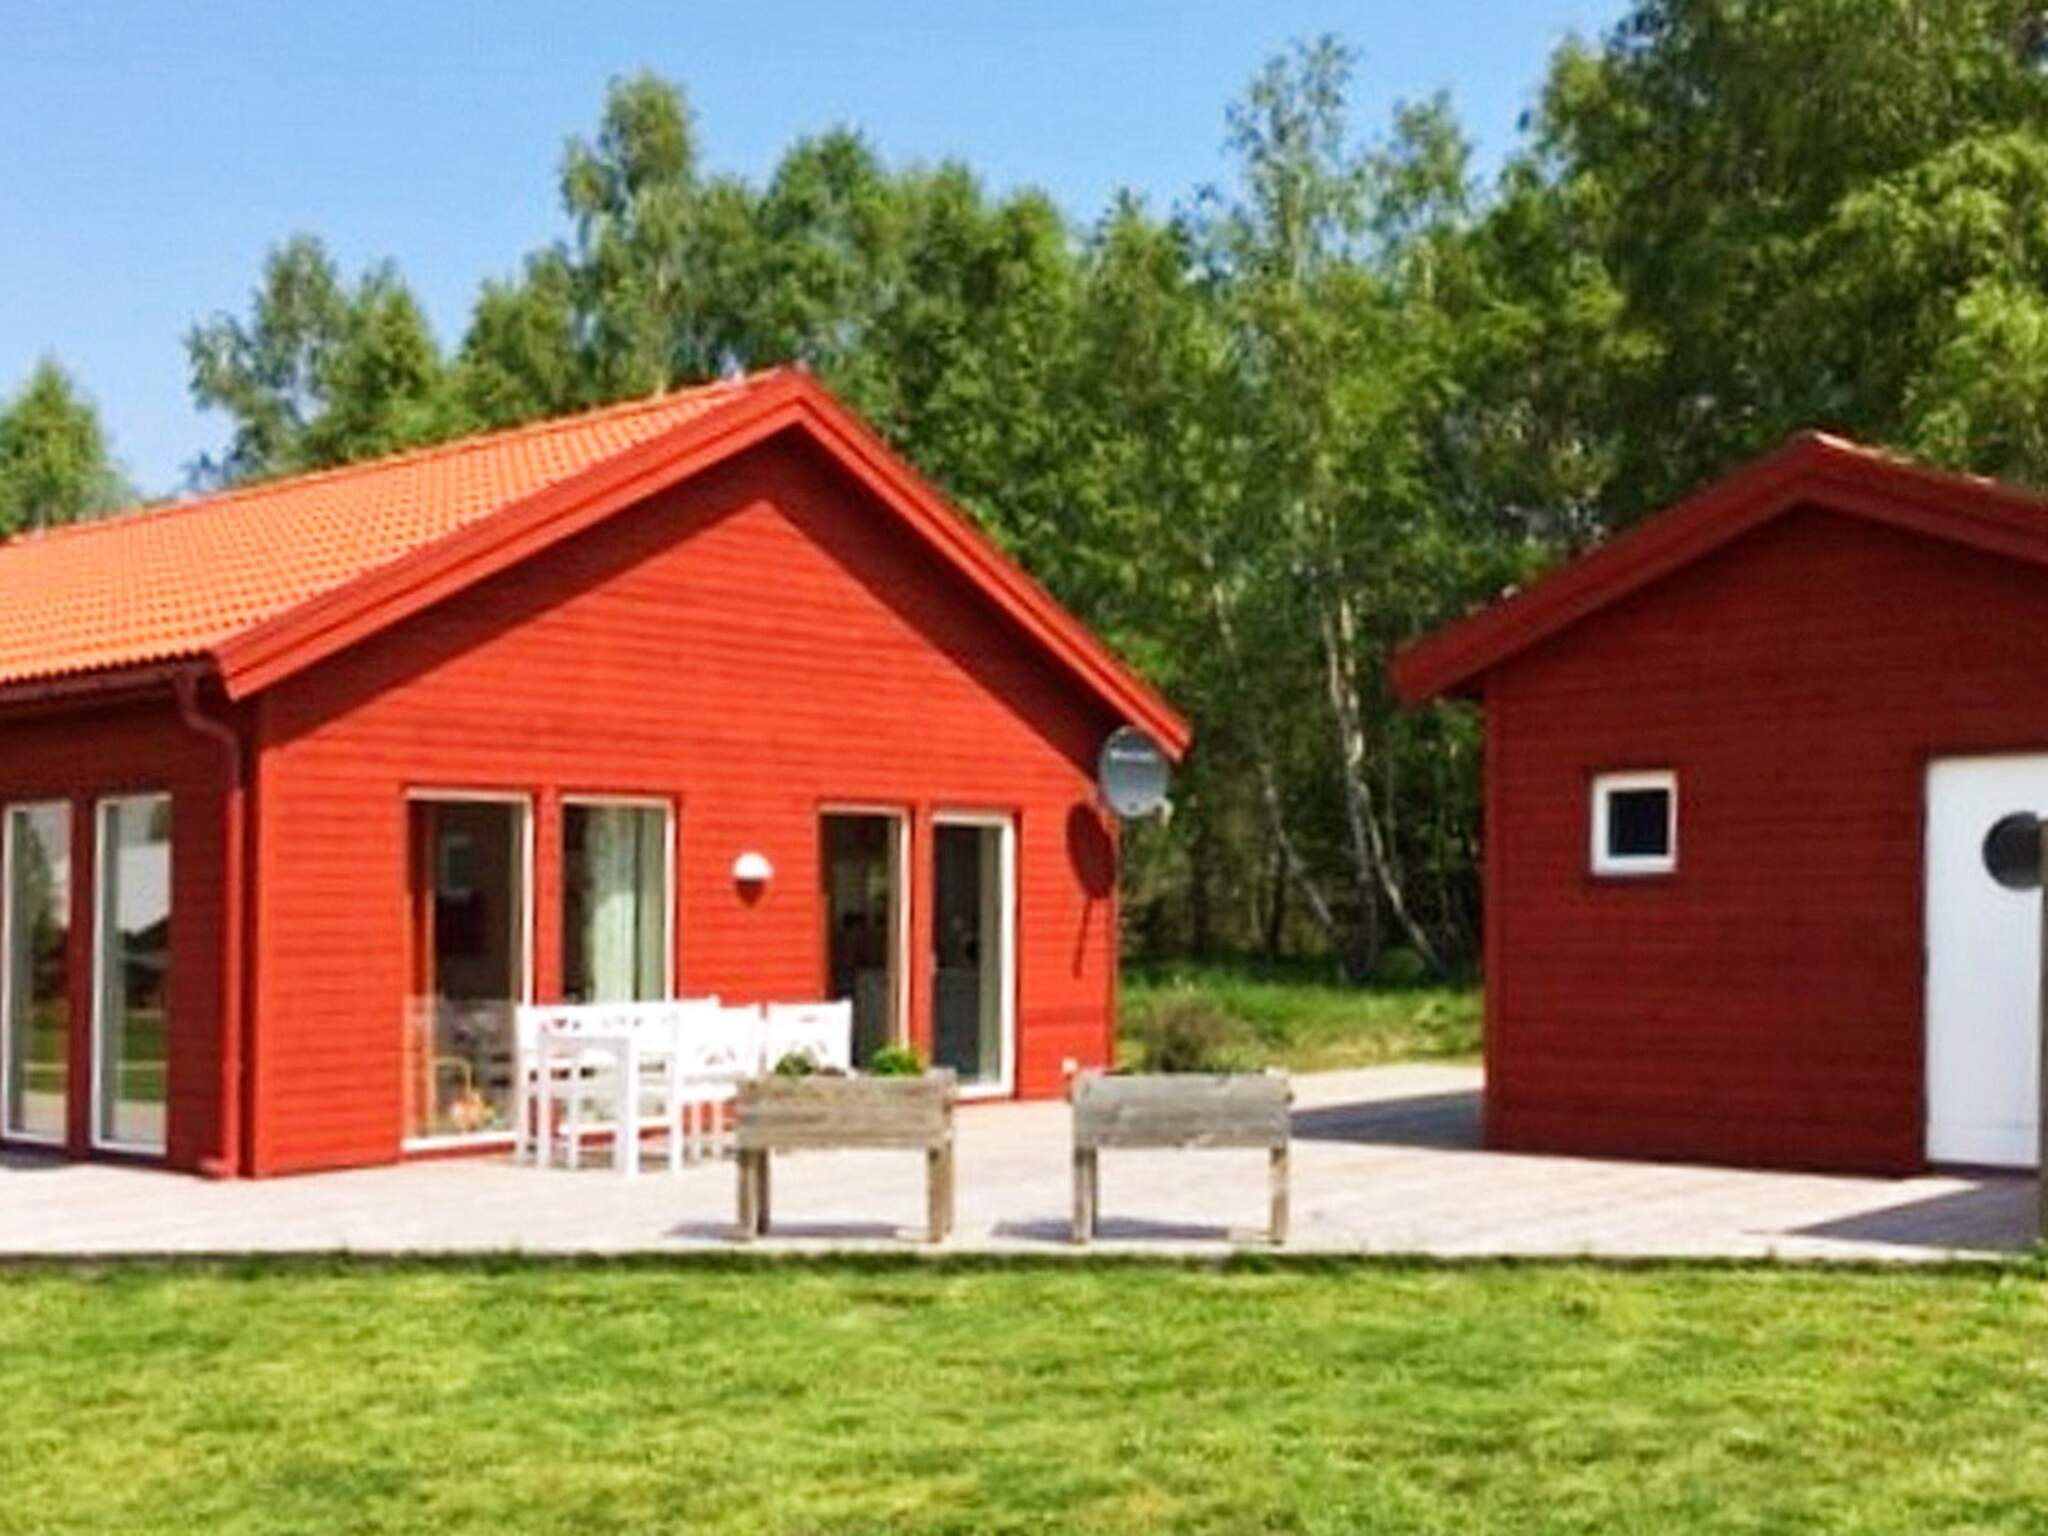 Ferienhaus Degeberga (2624324), Degeberga, Skane län, Südschweden, Schweden, Bild 12